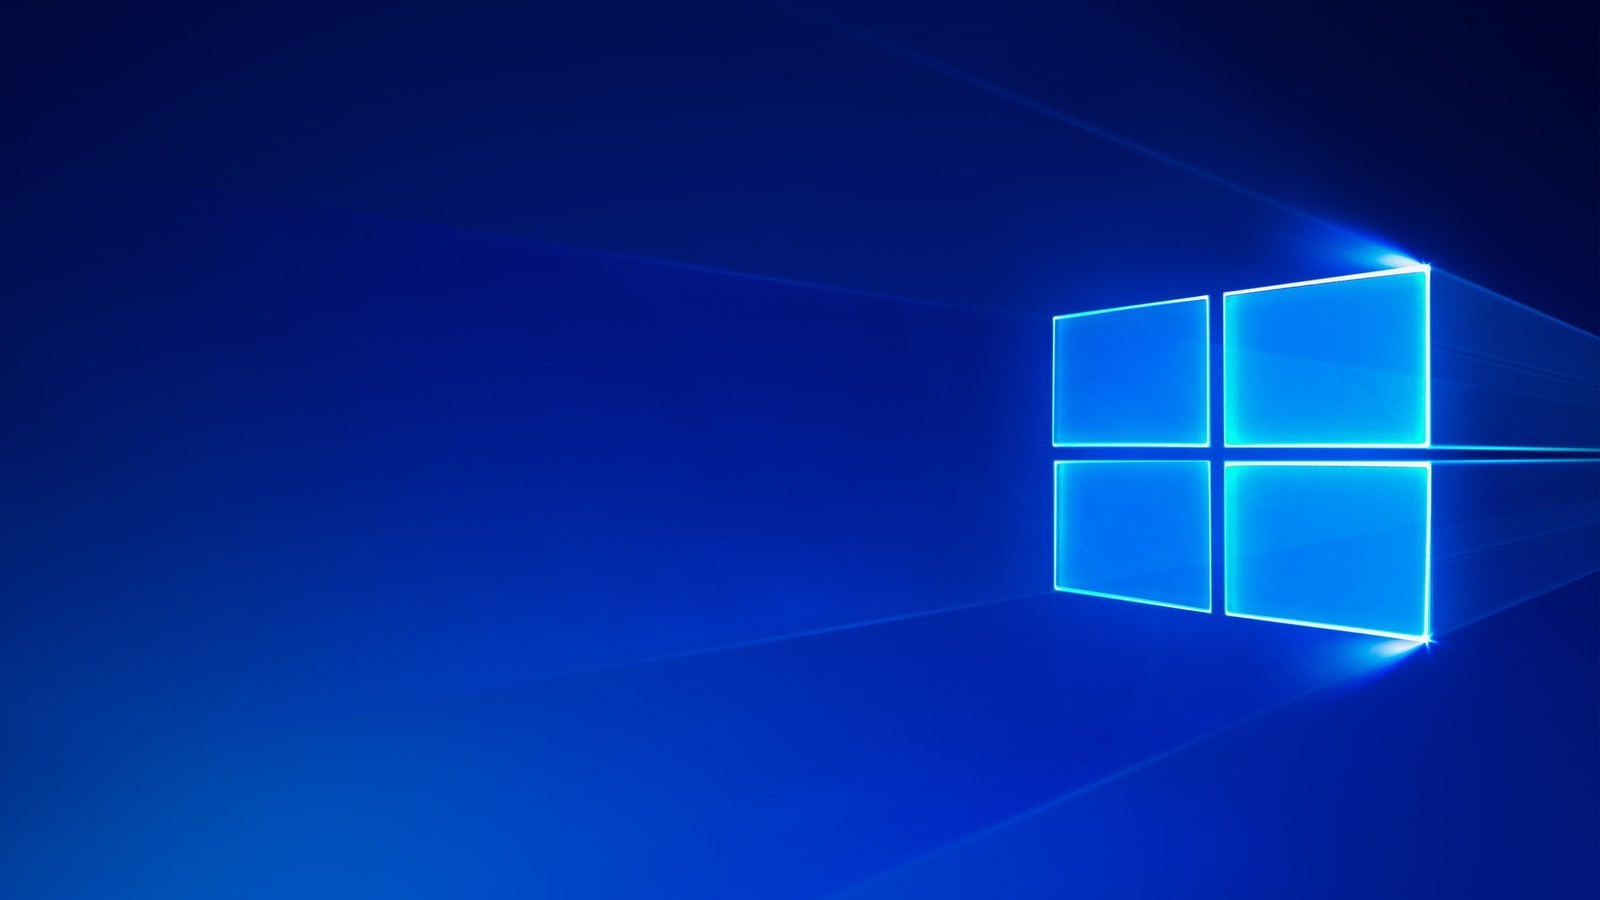 reparer Windows 10 opdateringsfejl 0x80242006